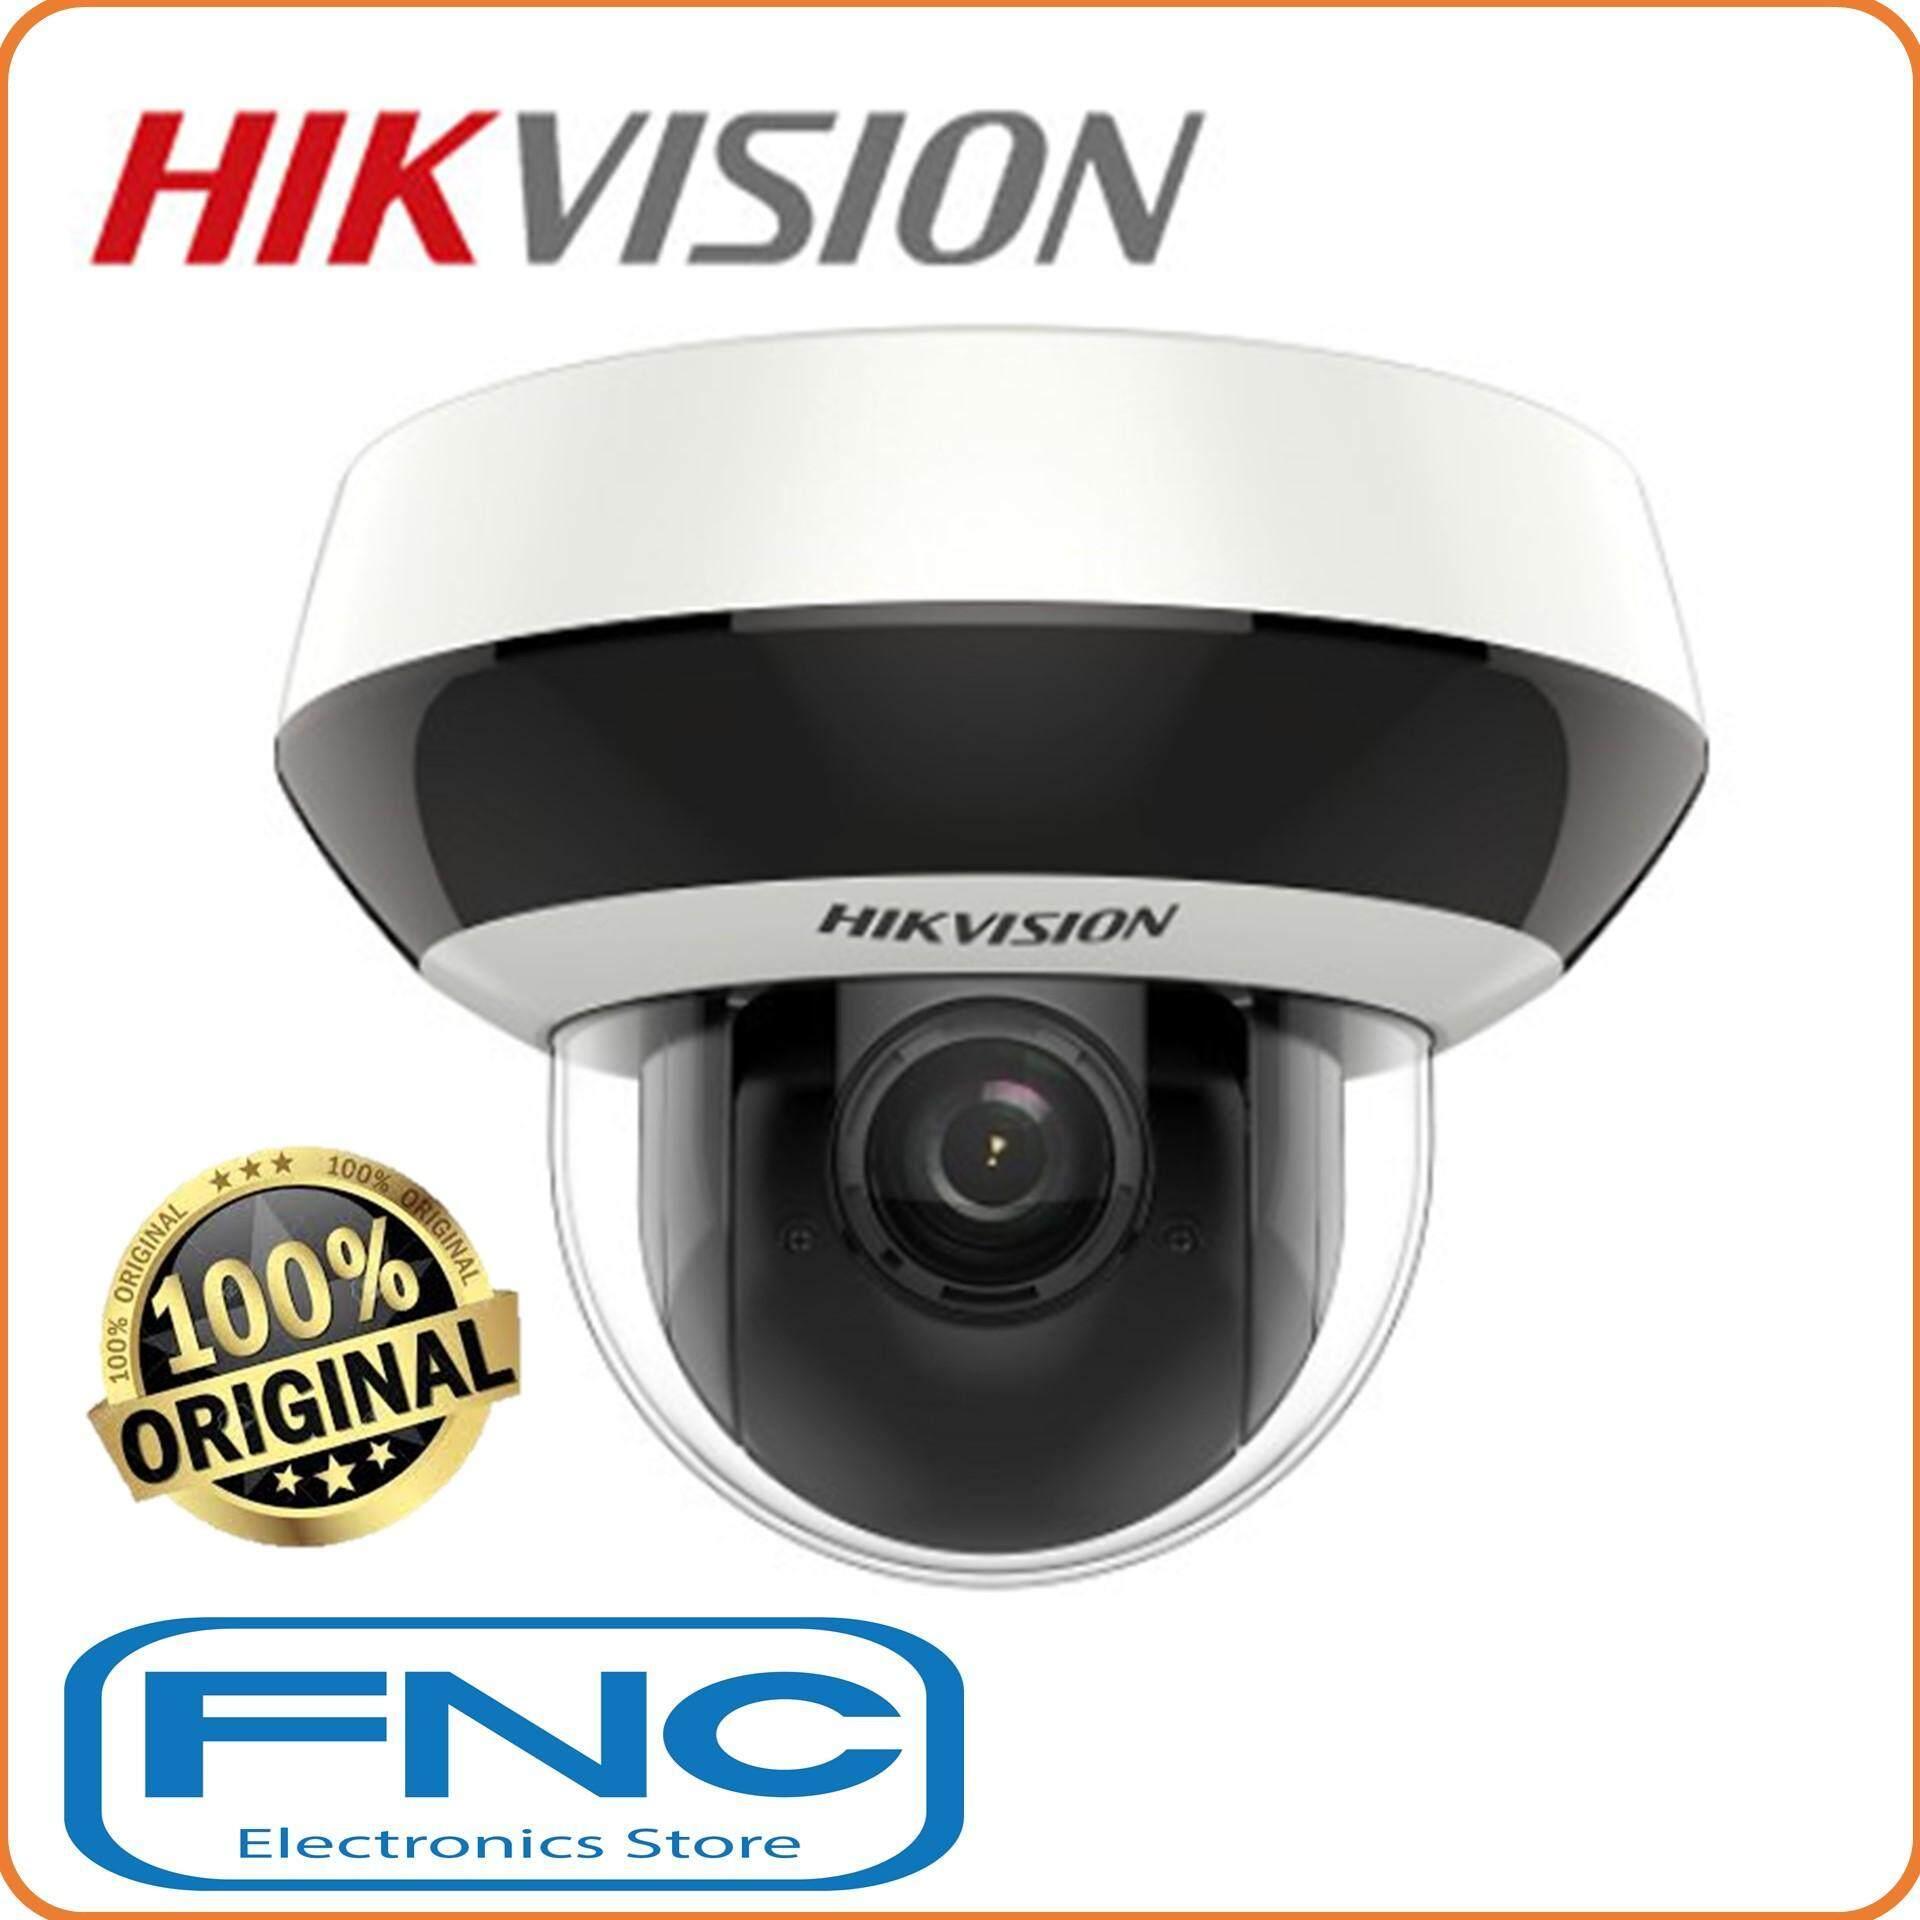 Hikvision Ds-2de2a204iw-De3 Network Ptz 2mp 1080p 4x Optical Zoom Ir 20m Dome Ip Camera By Fnc Electronics Store.